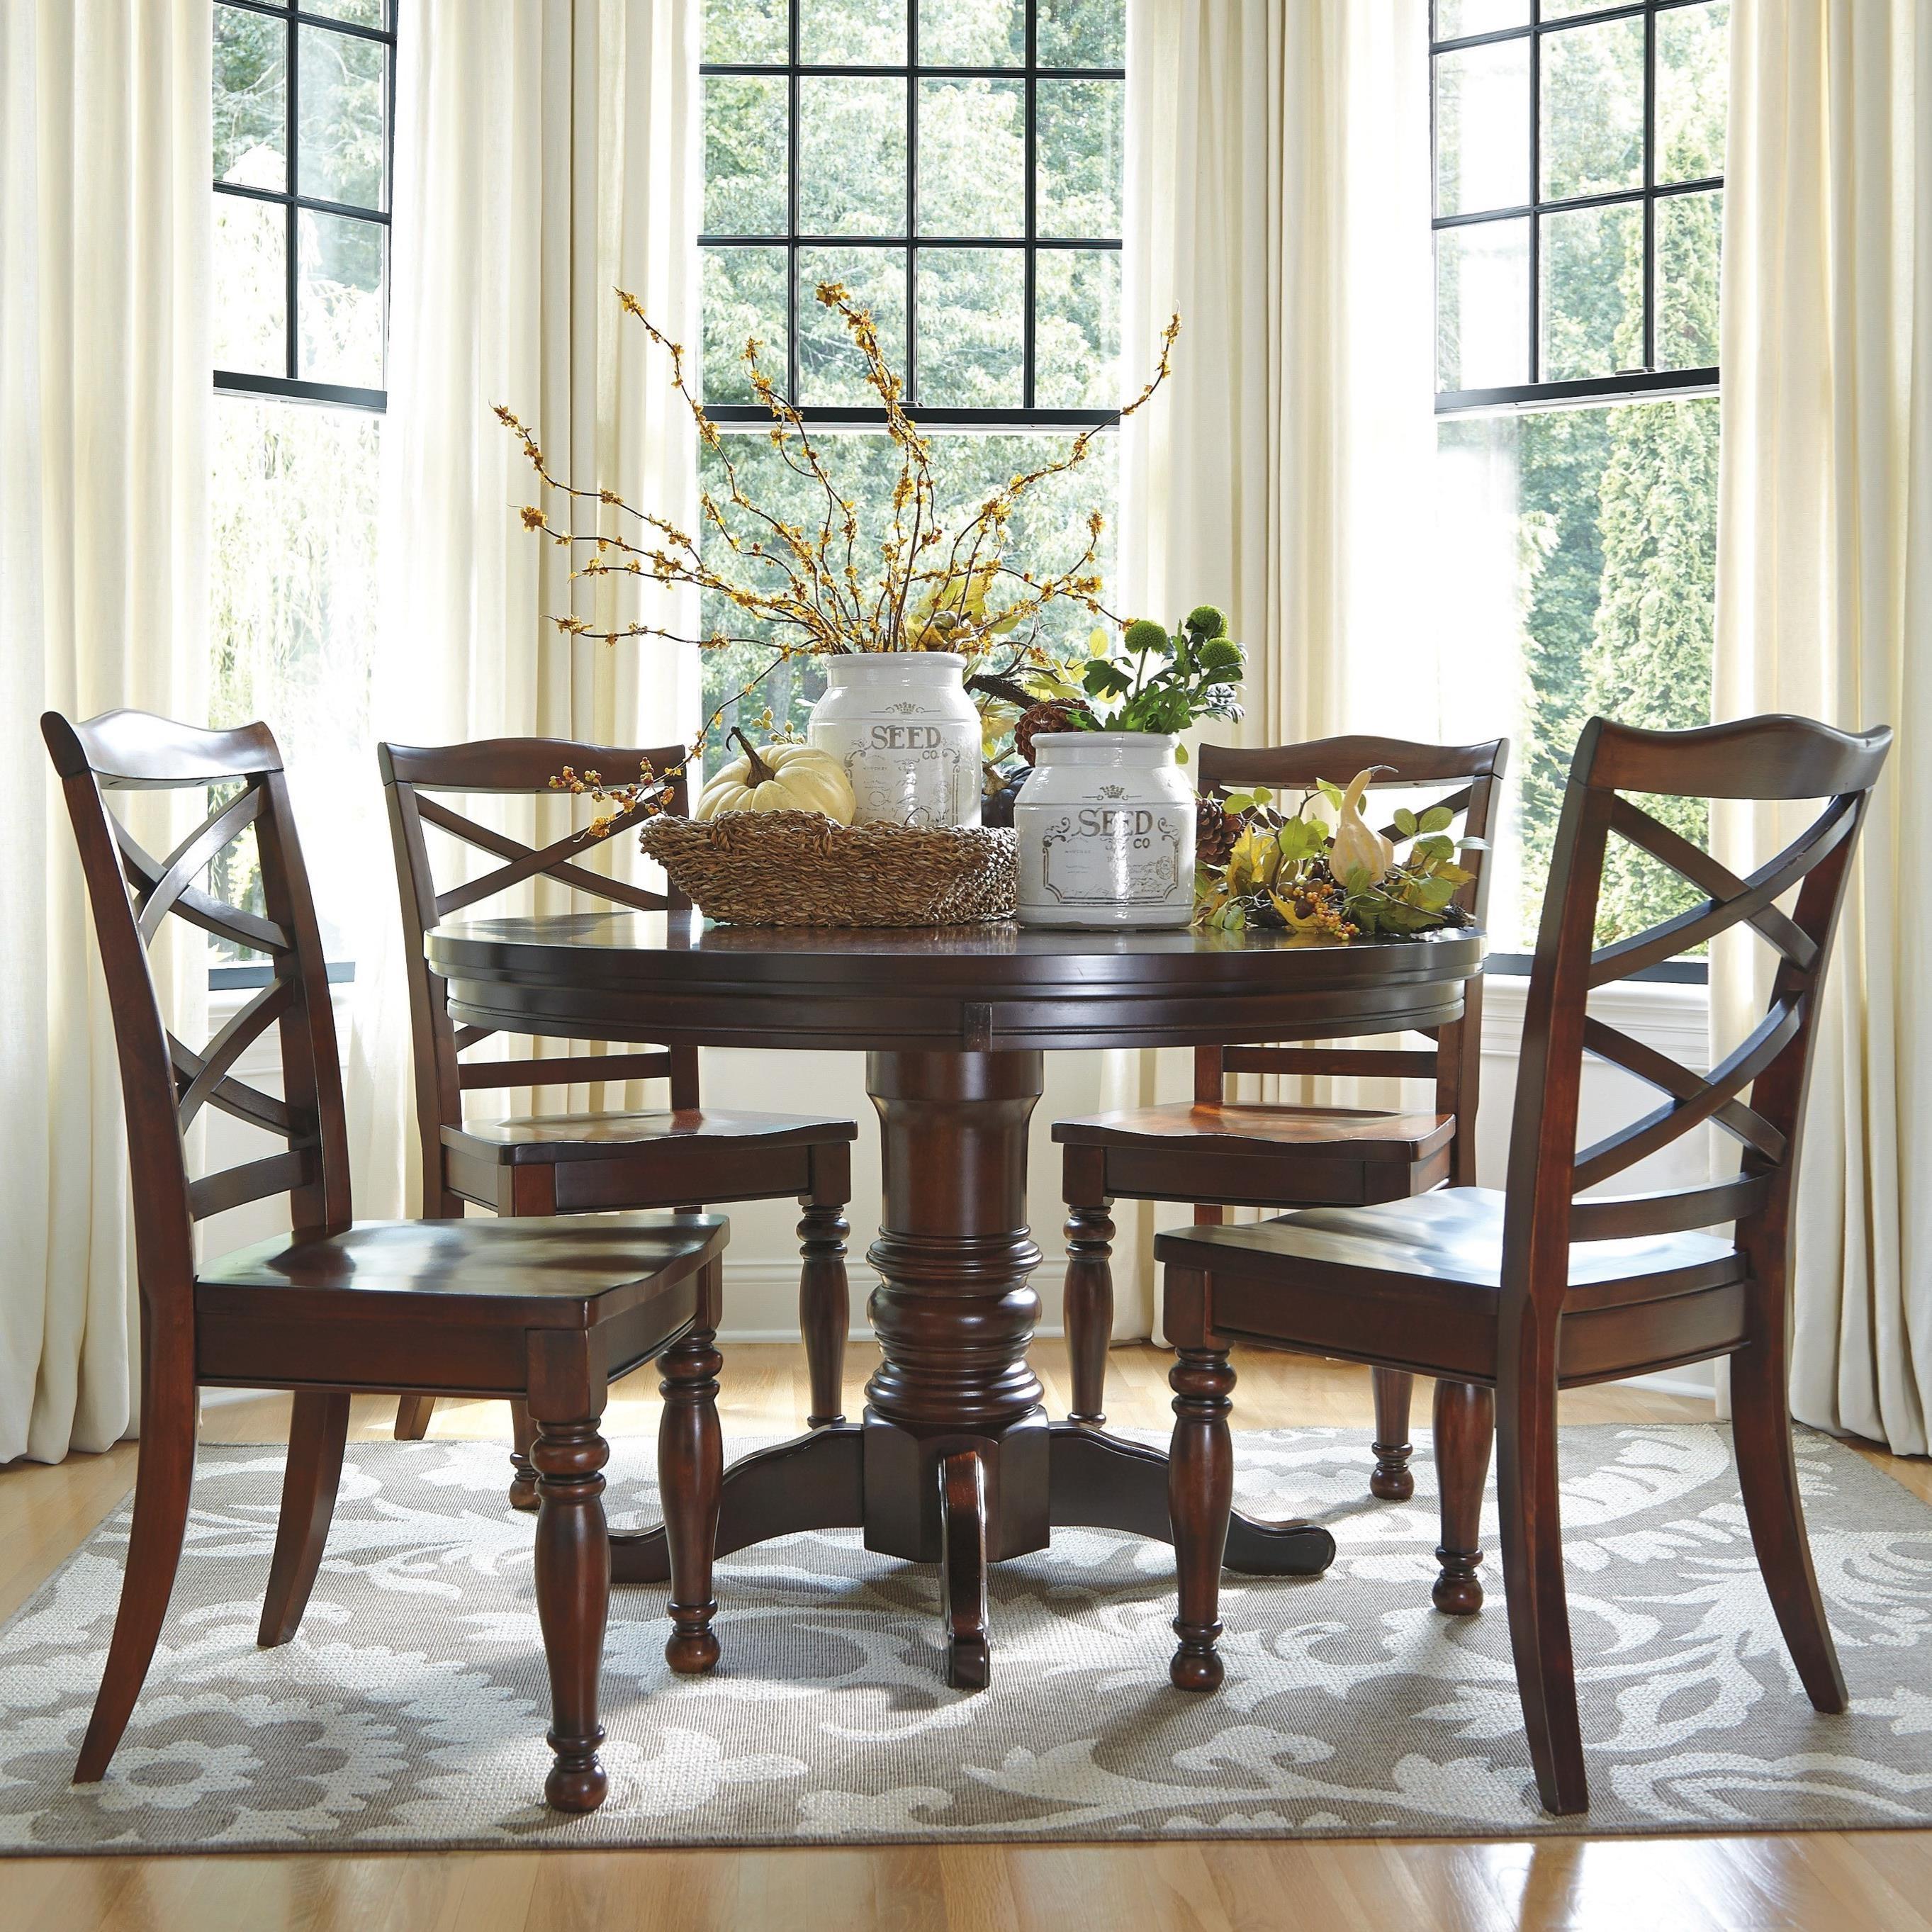 ashley furniture porter 5piece round dining table set john v schultz furniture dining 5 piece sets